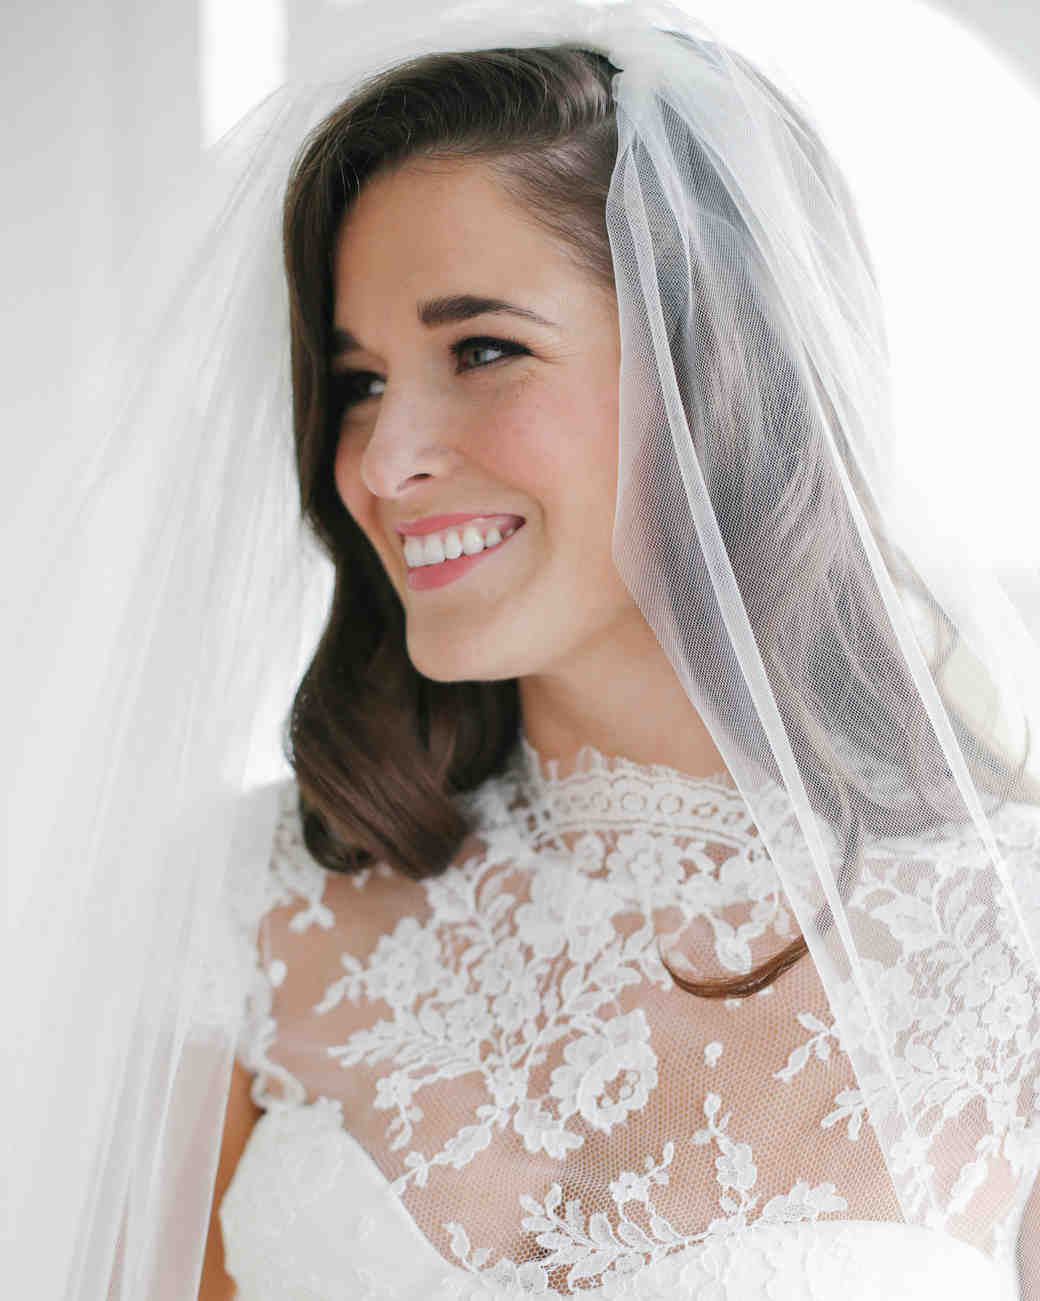 destiny-taylor-wedding-bride-84-s112347-1115.jpg